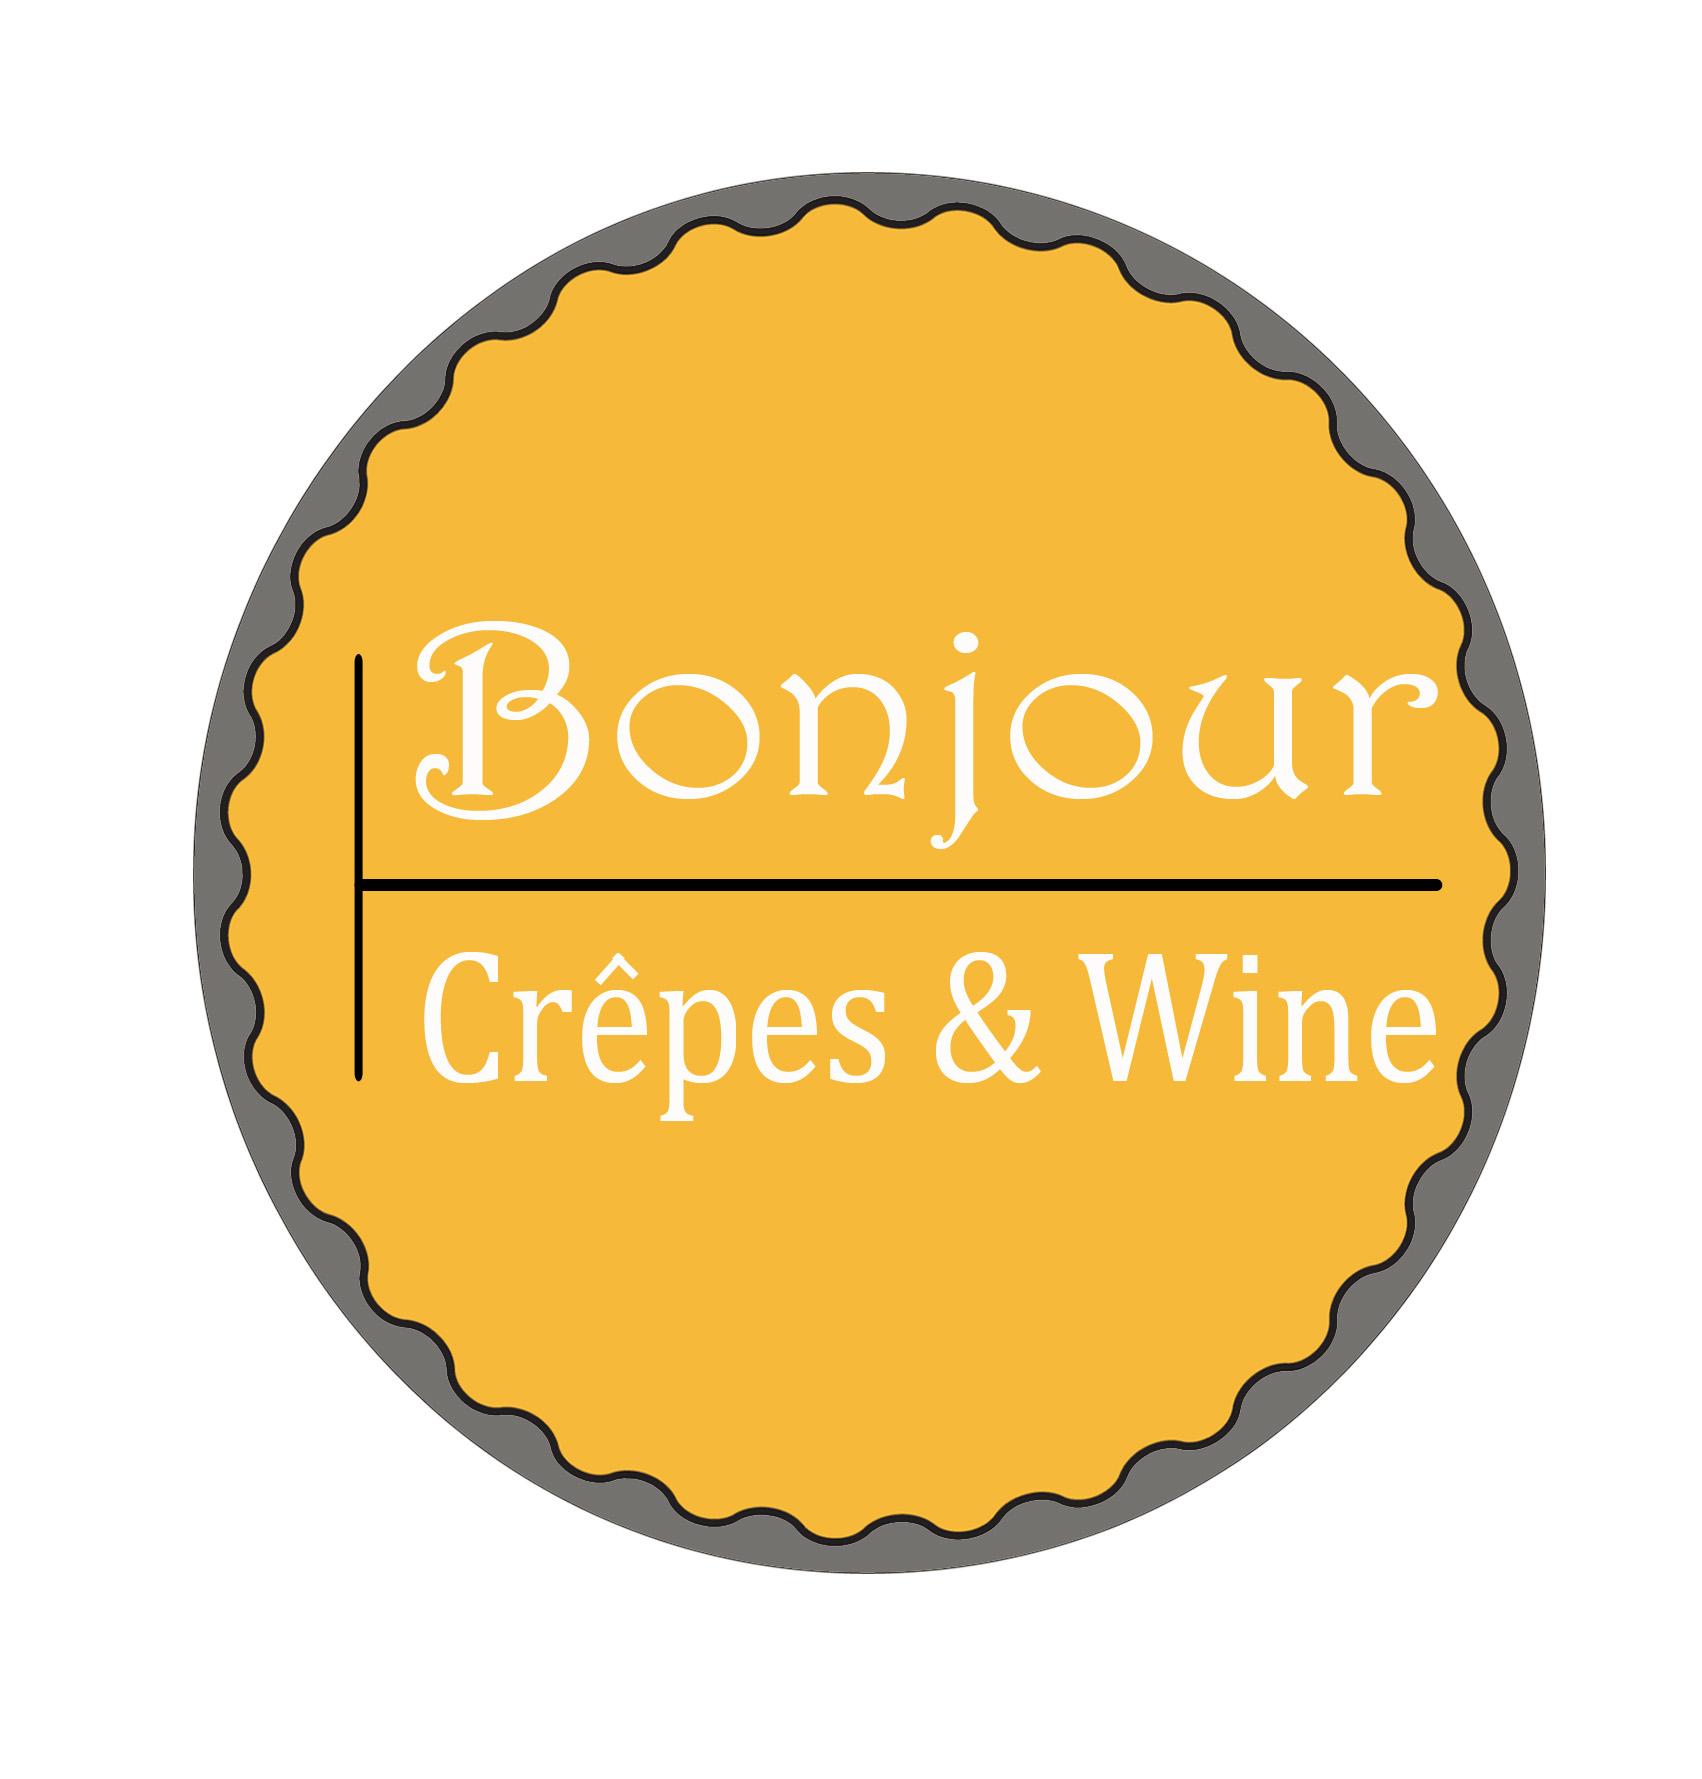 Bonjour Crepes & Wine image 1